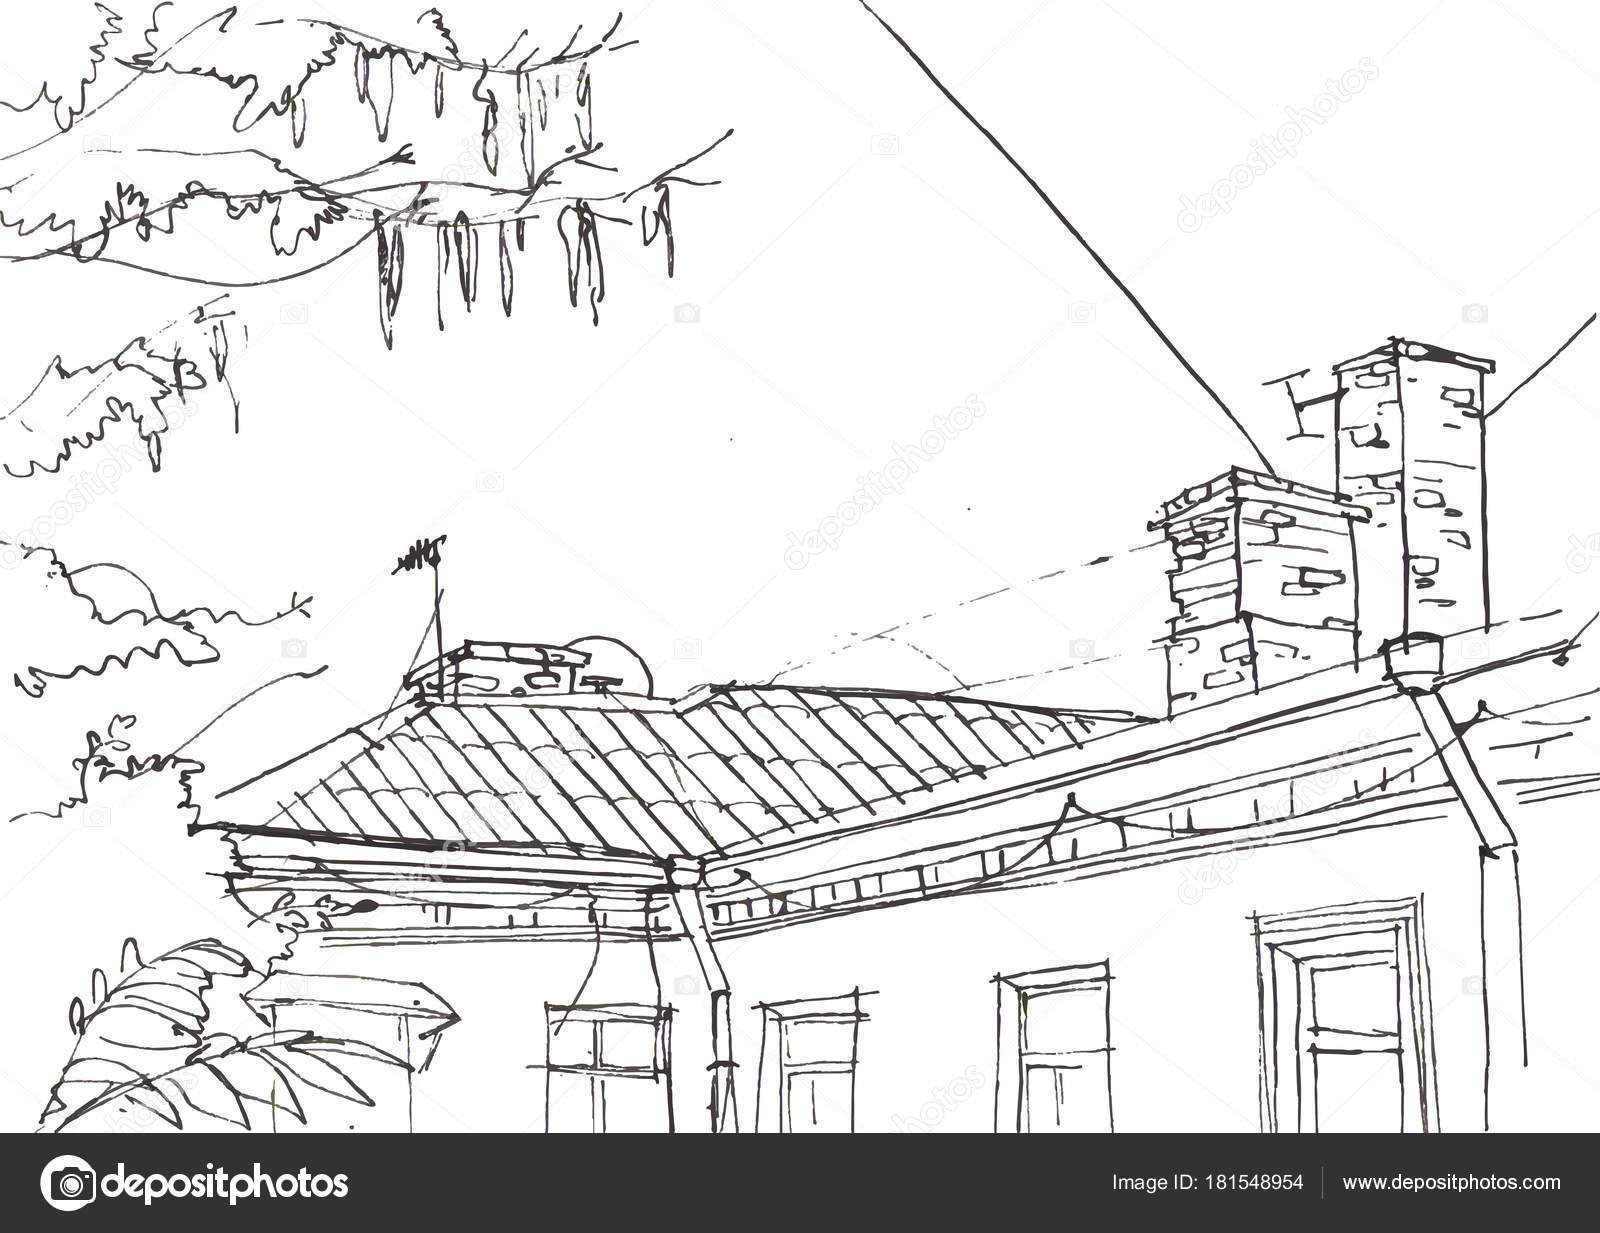 Architektur Skizze Handgezeichnete Vektor Illustration Doodle ...